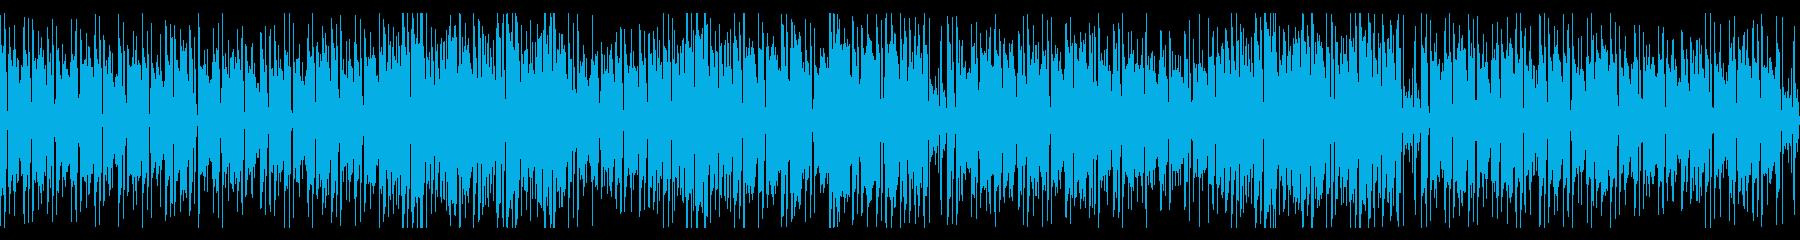 FMで流れてそうなR&B系スムースジャズの再生済みの波形